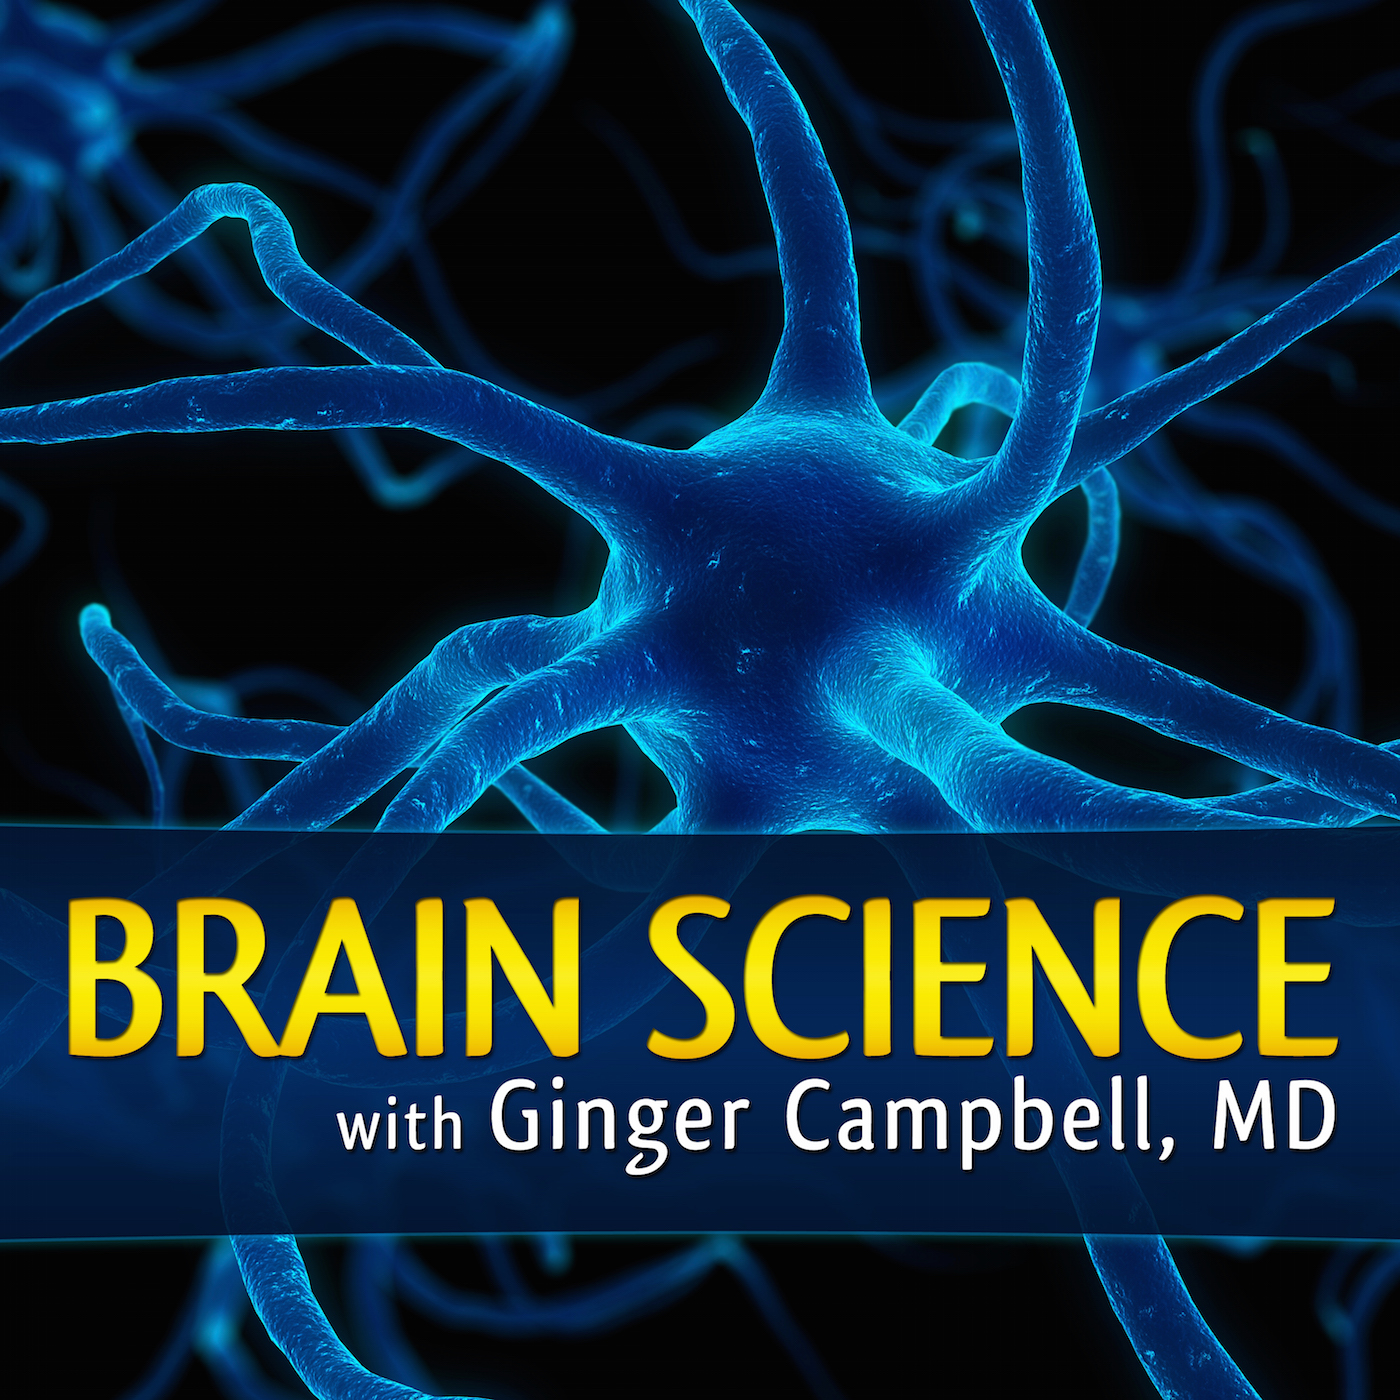 Brain Science 2020 (Trailer) show art